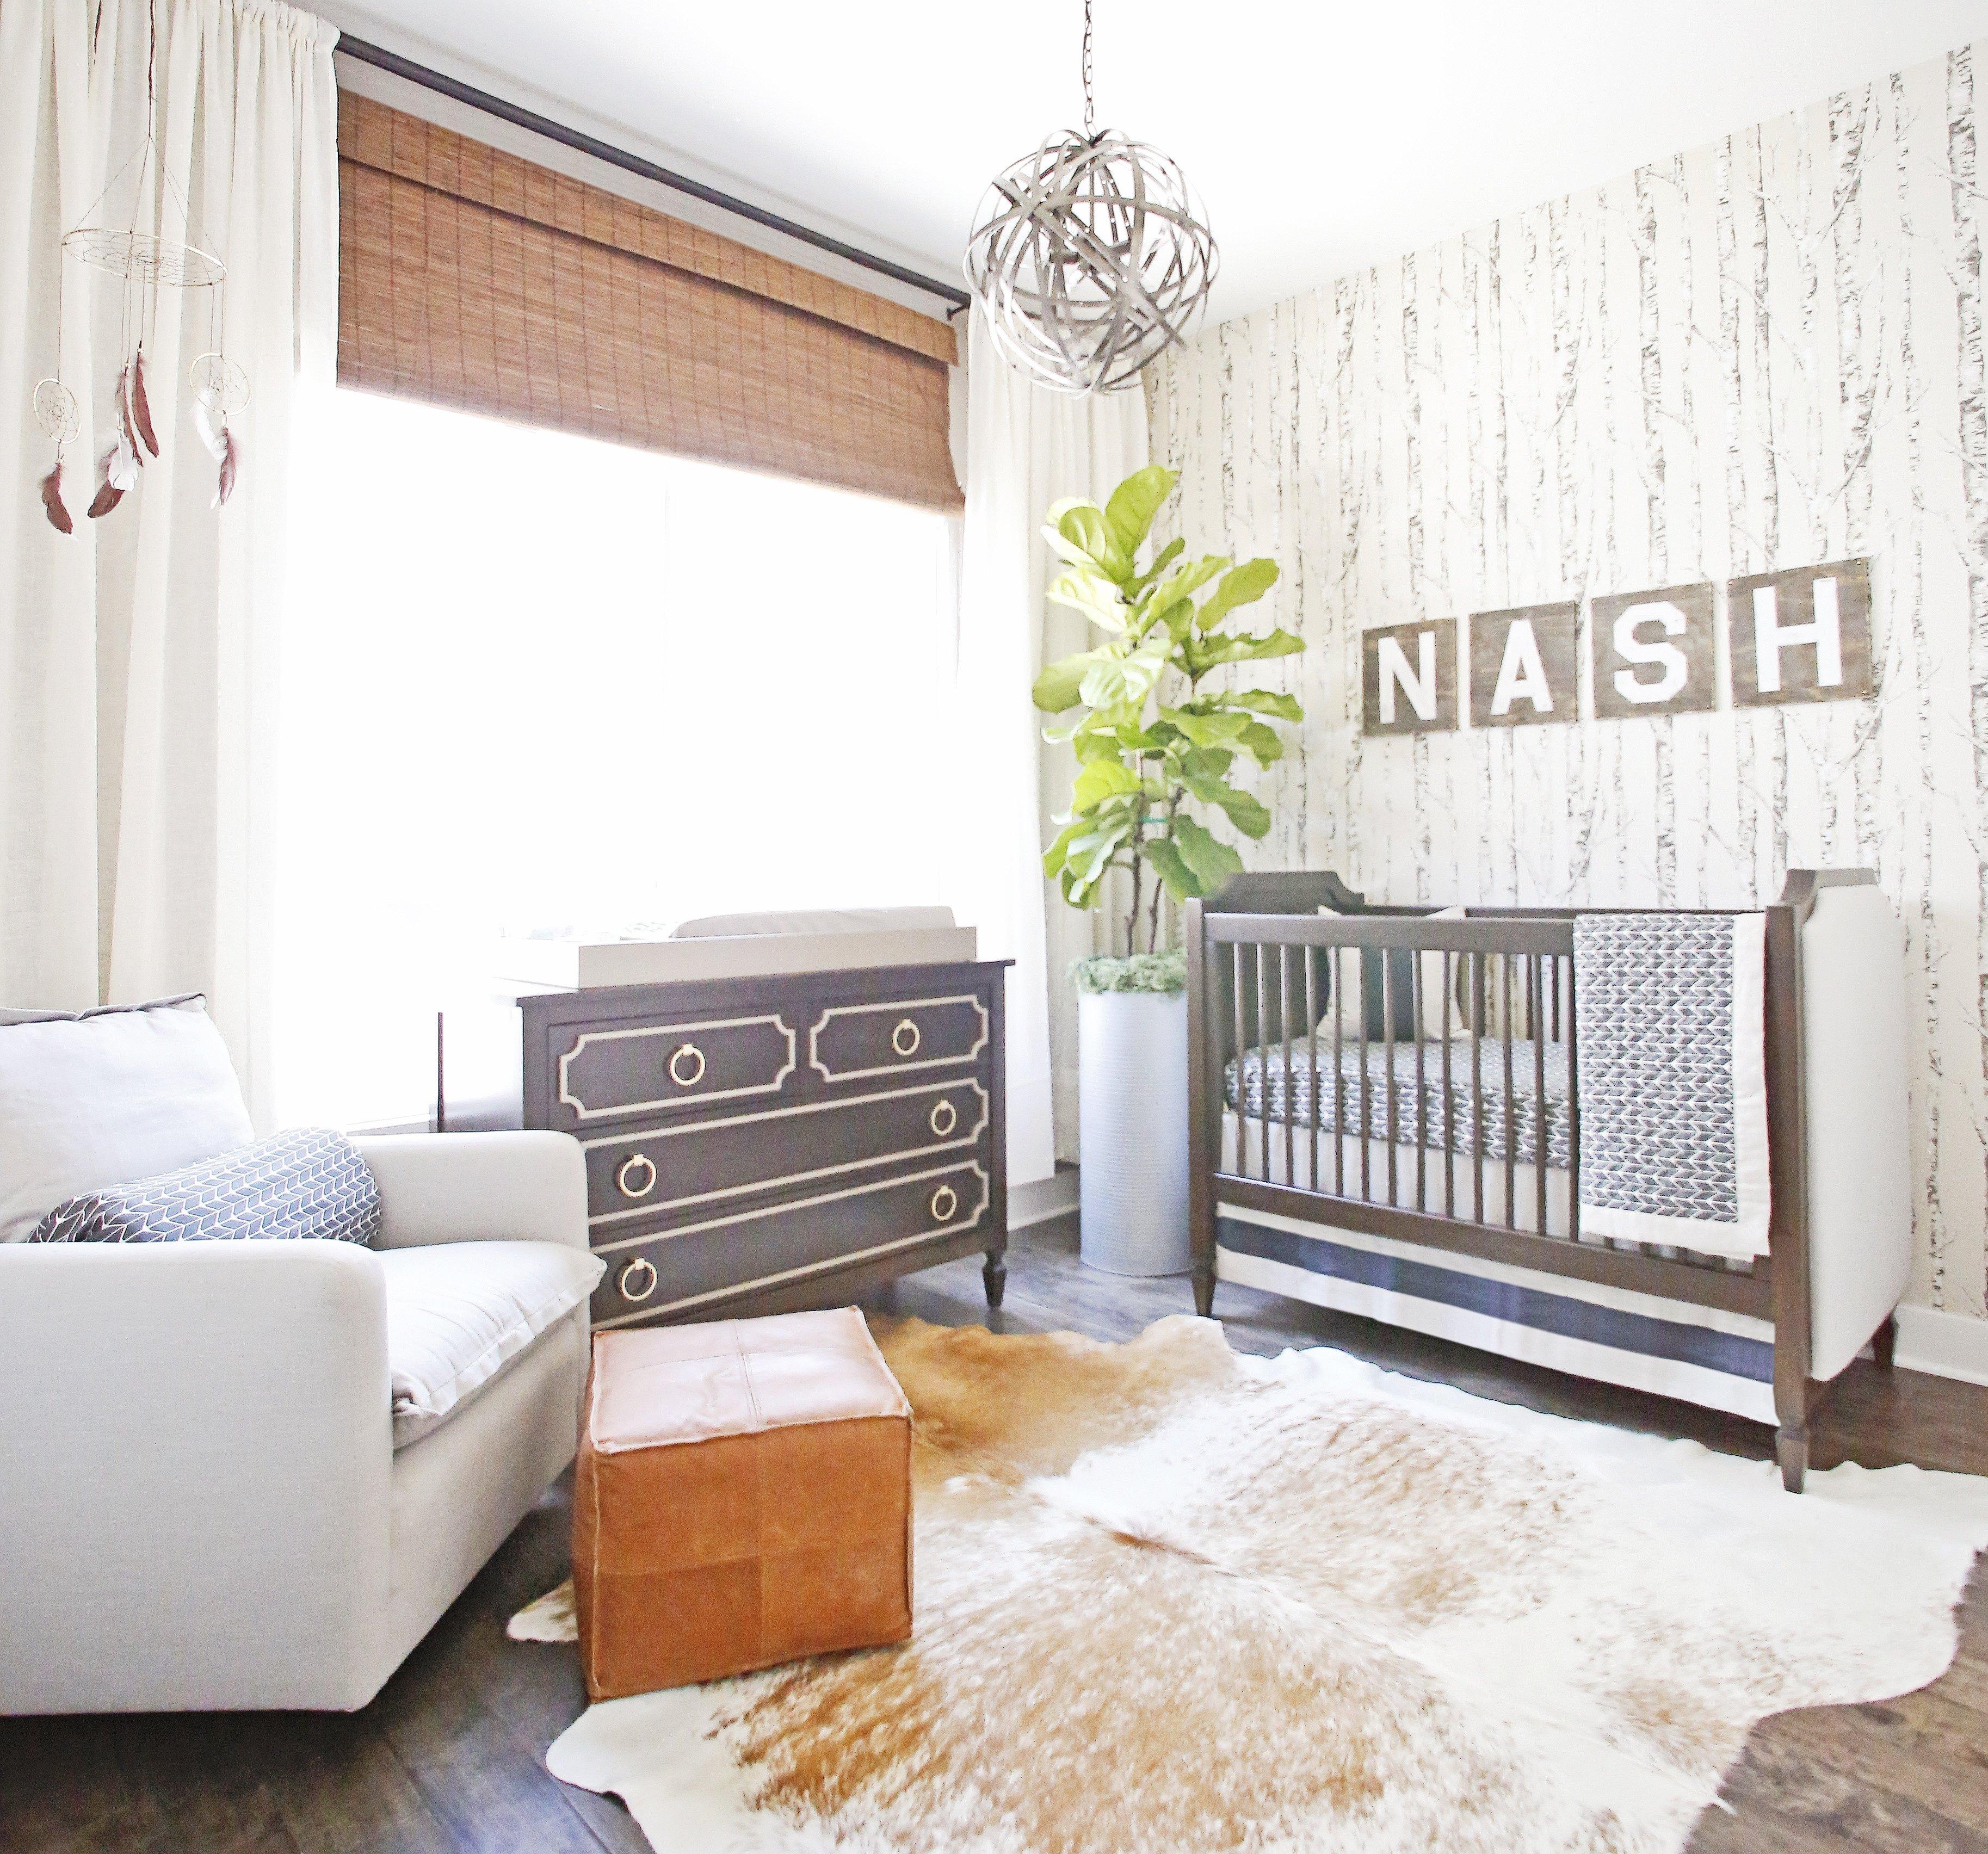 10 Lovely Baby Boy Nursery Ideas Pinterest images about rustic nursery ideas on pinterest project chic baby boy 2021